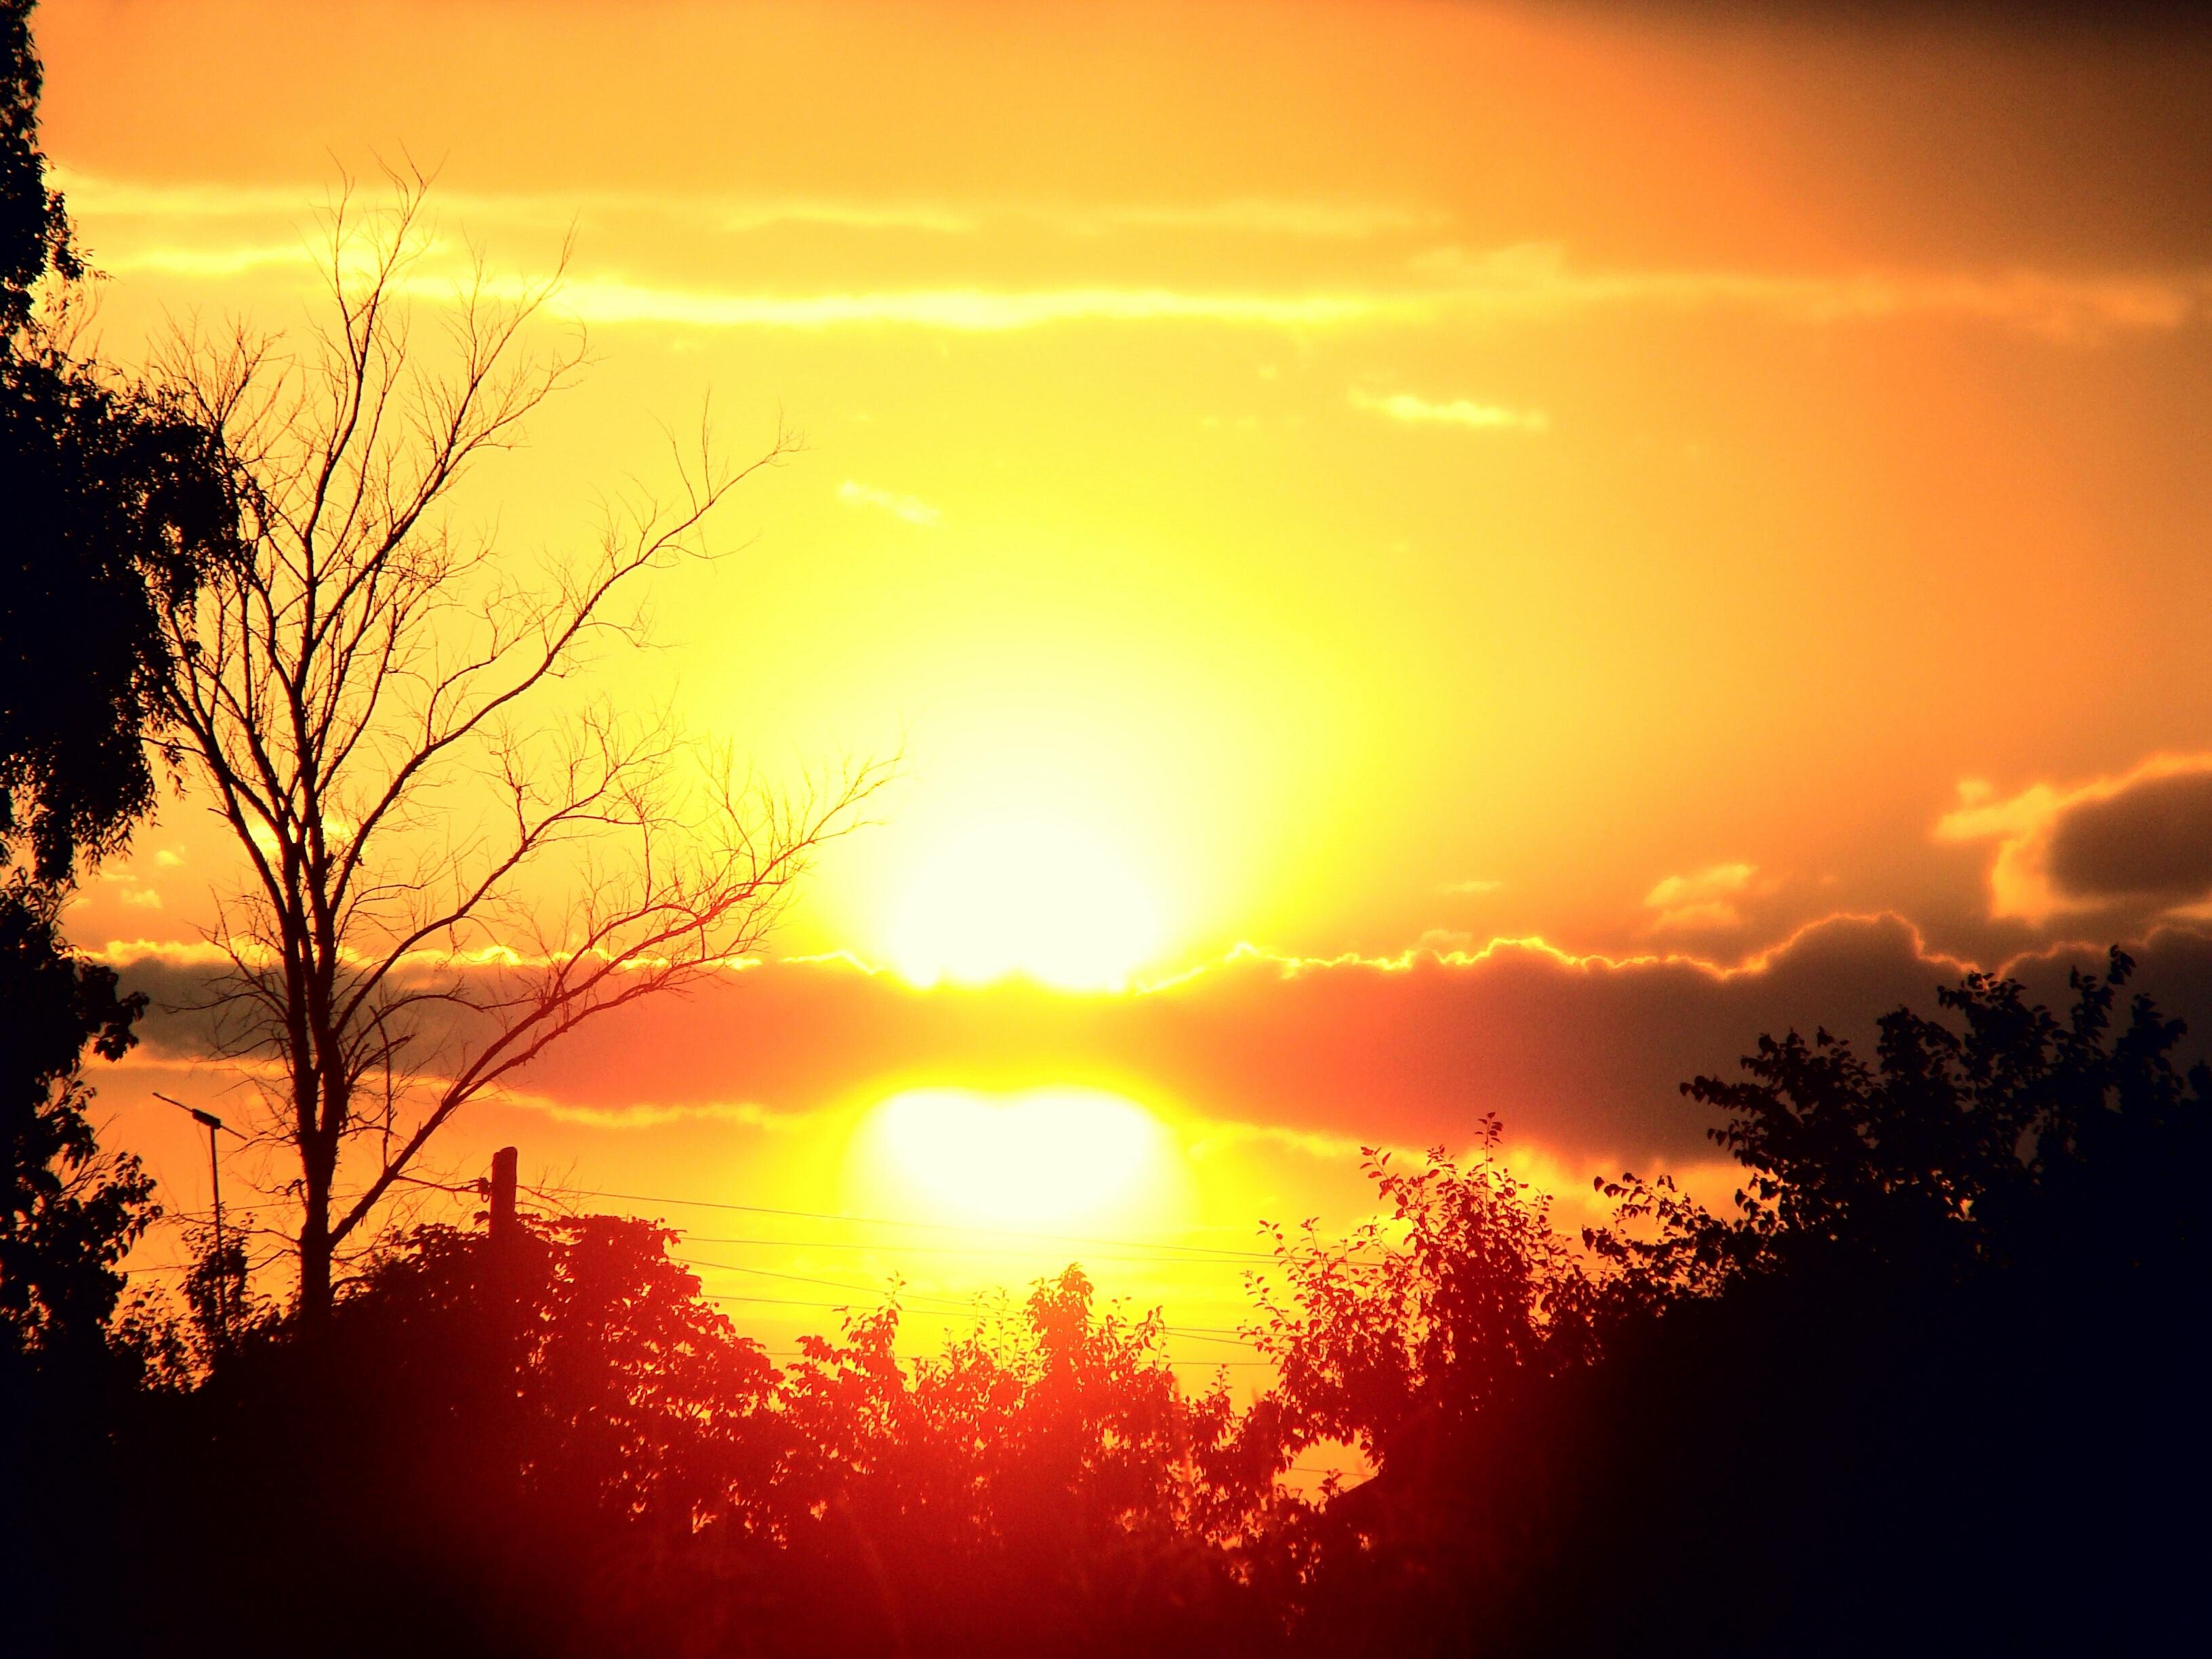 Красивые картинки восхода заката солнца